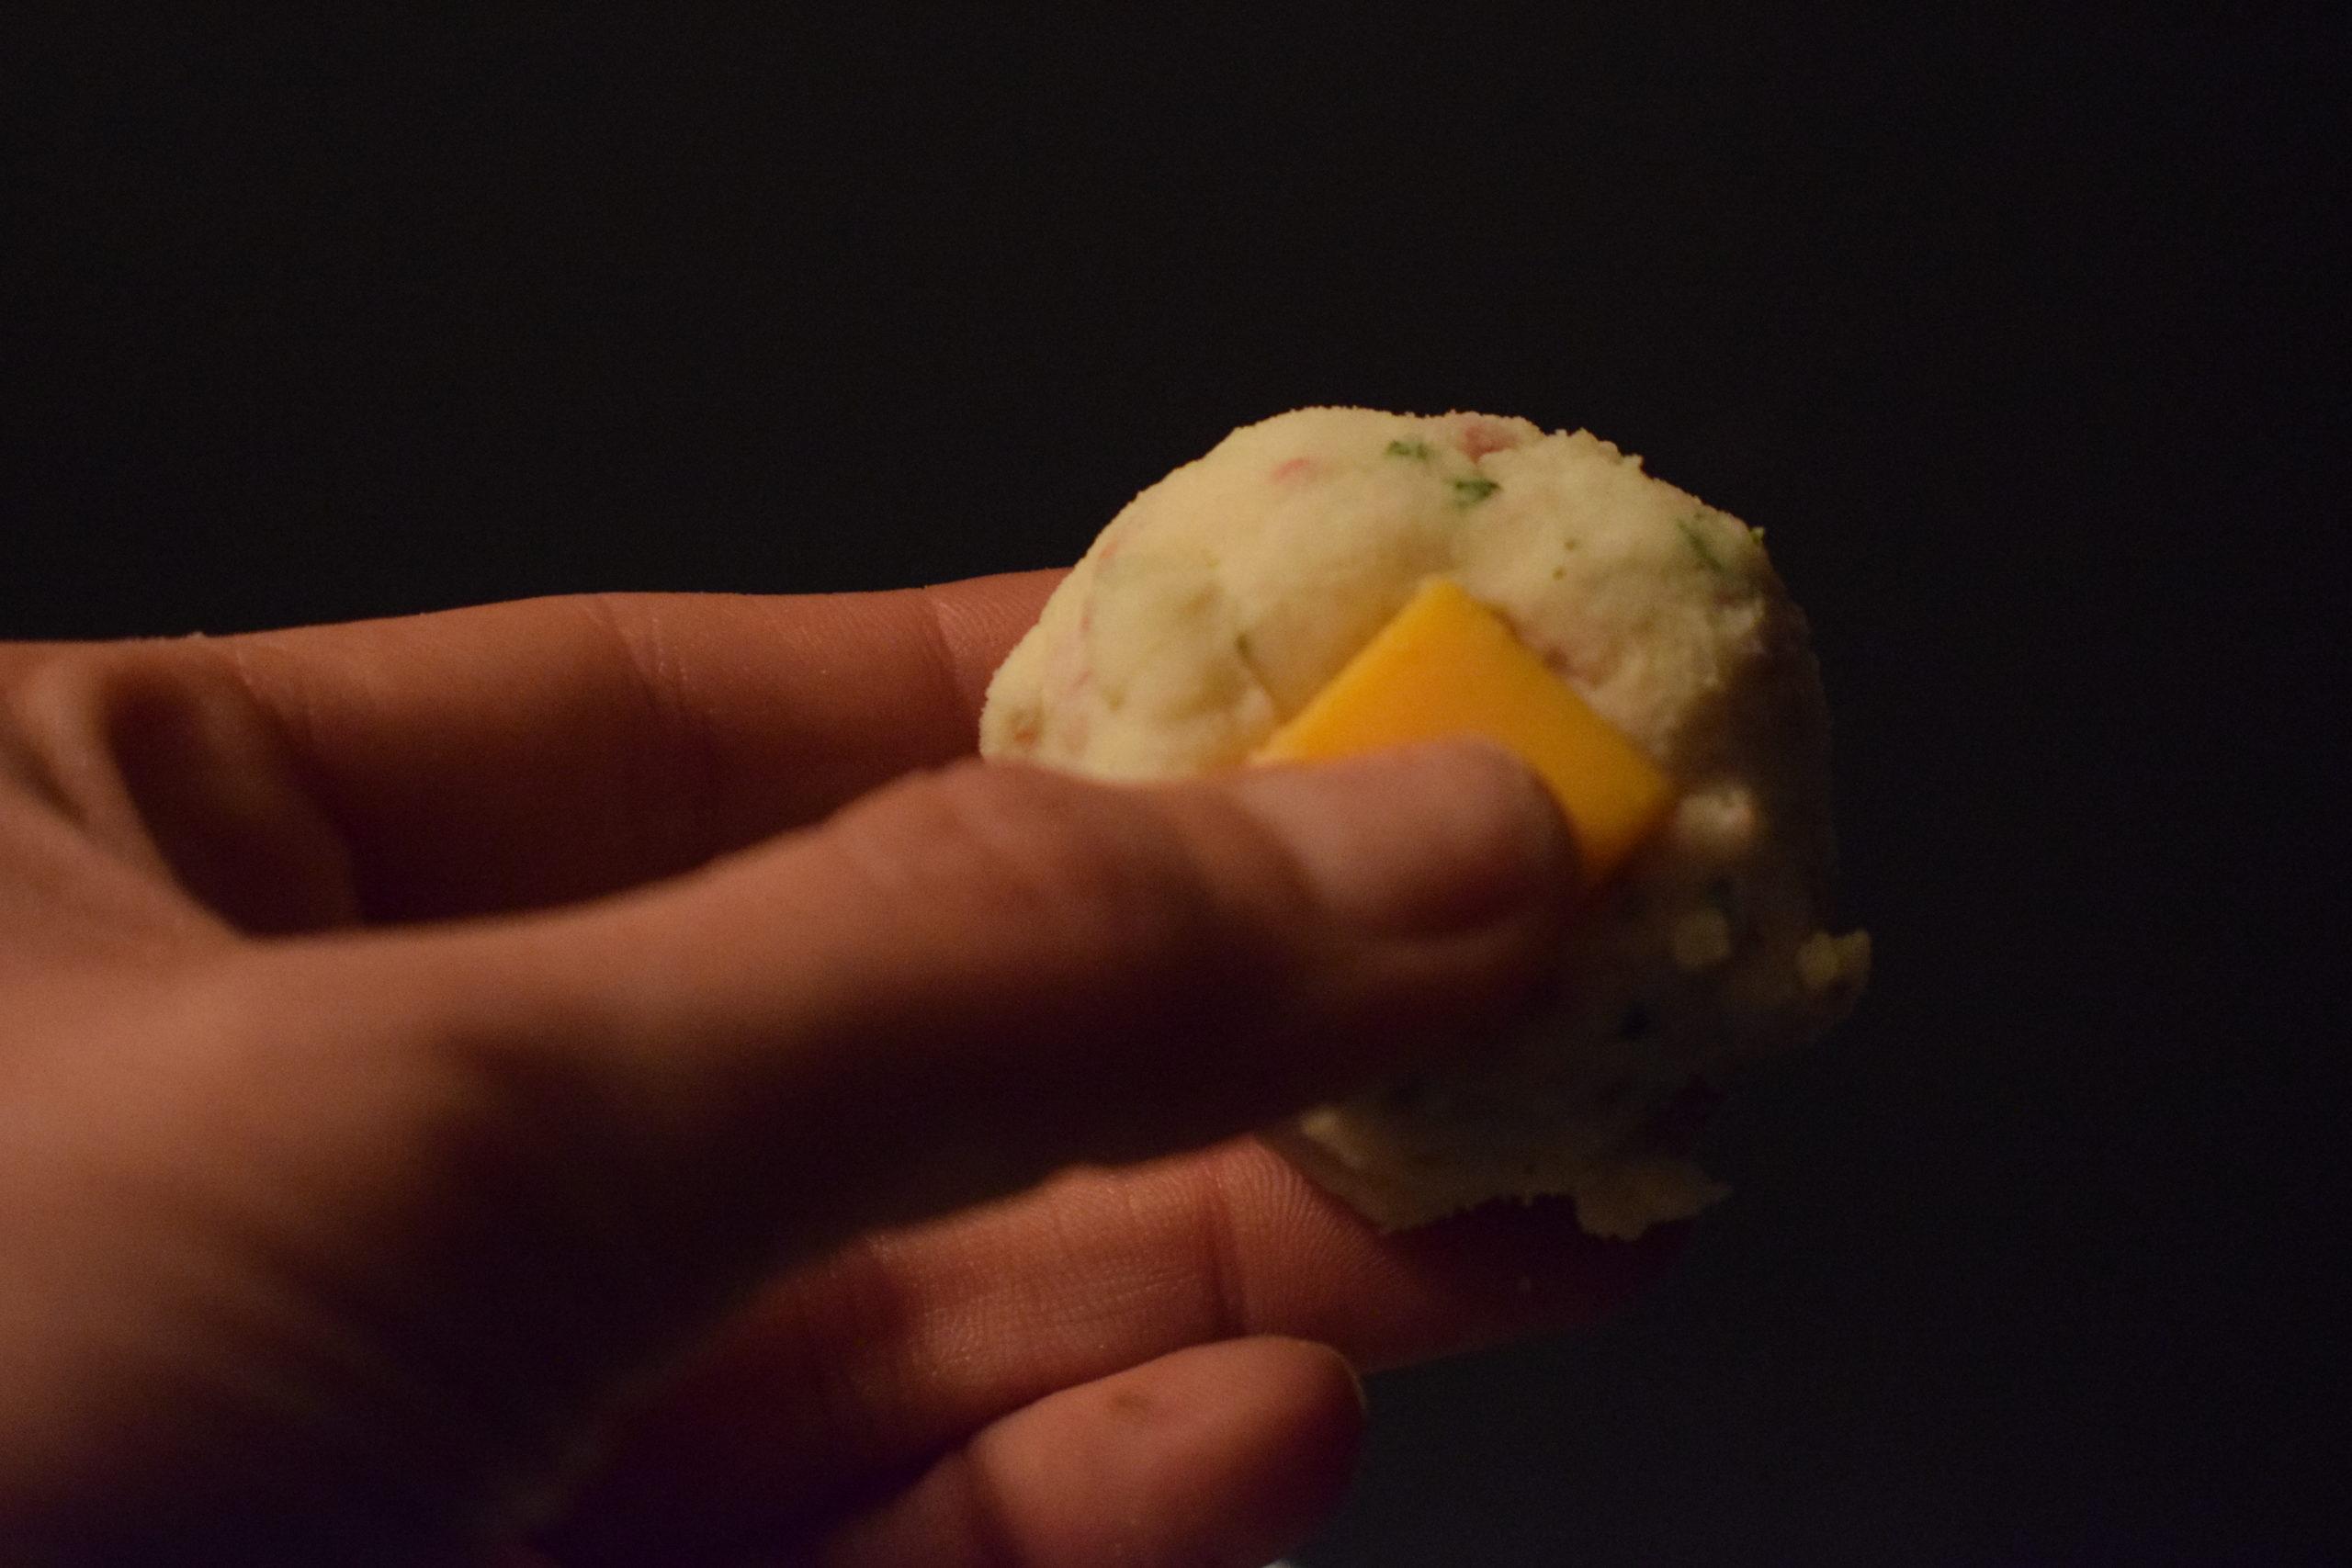 Thumb pushing cheddar cheese into mashed potato ball